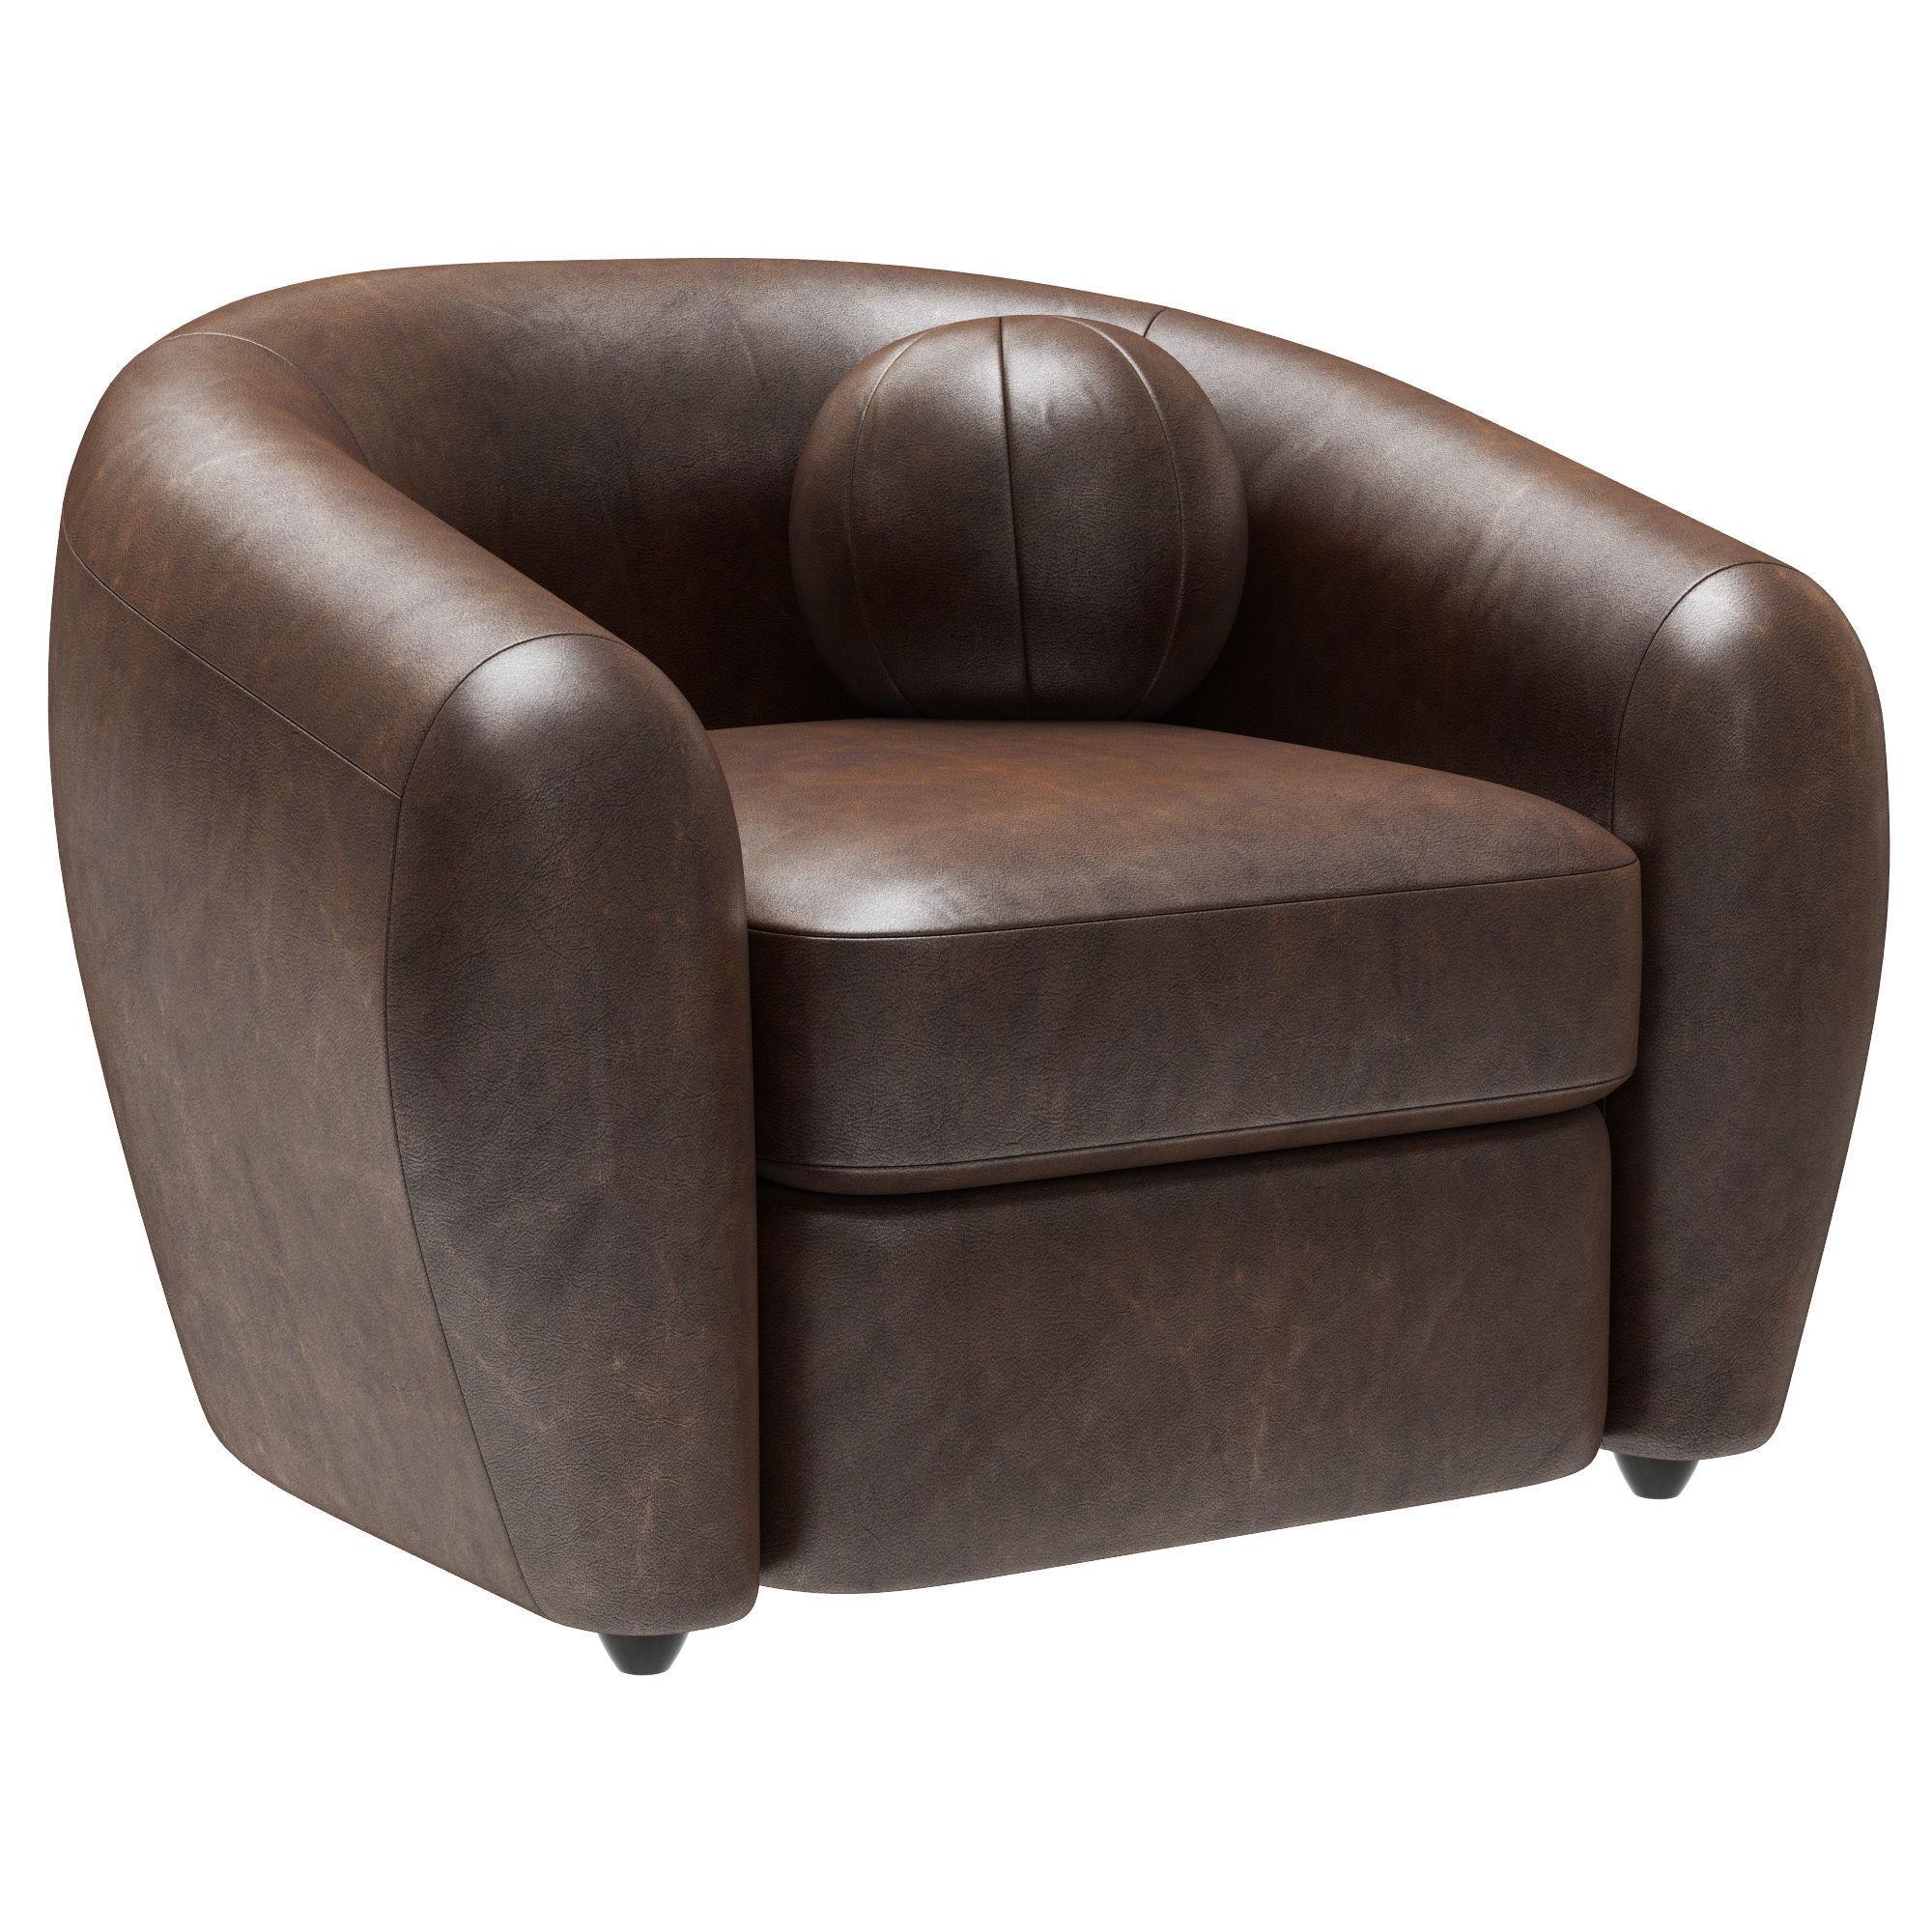 Restoration Hardware Sylvain Leather Chair